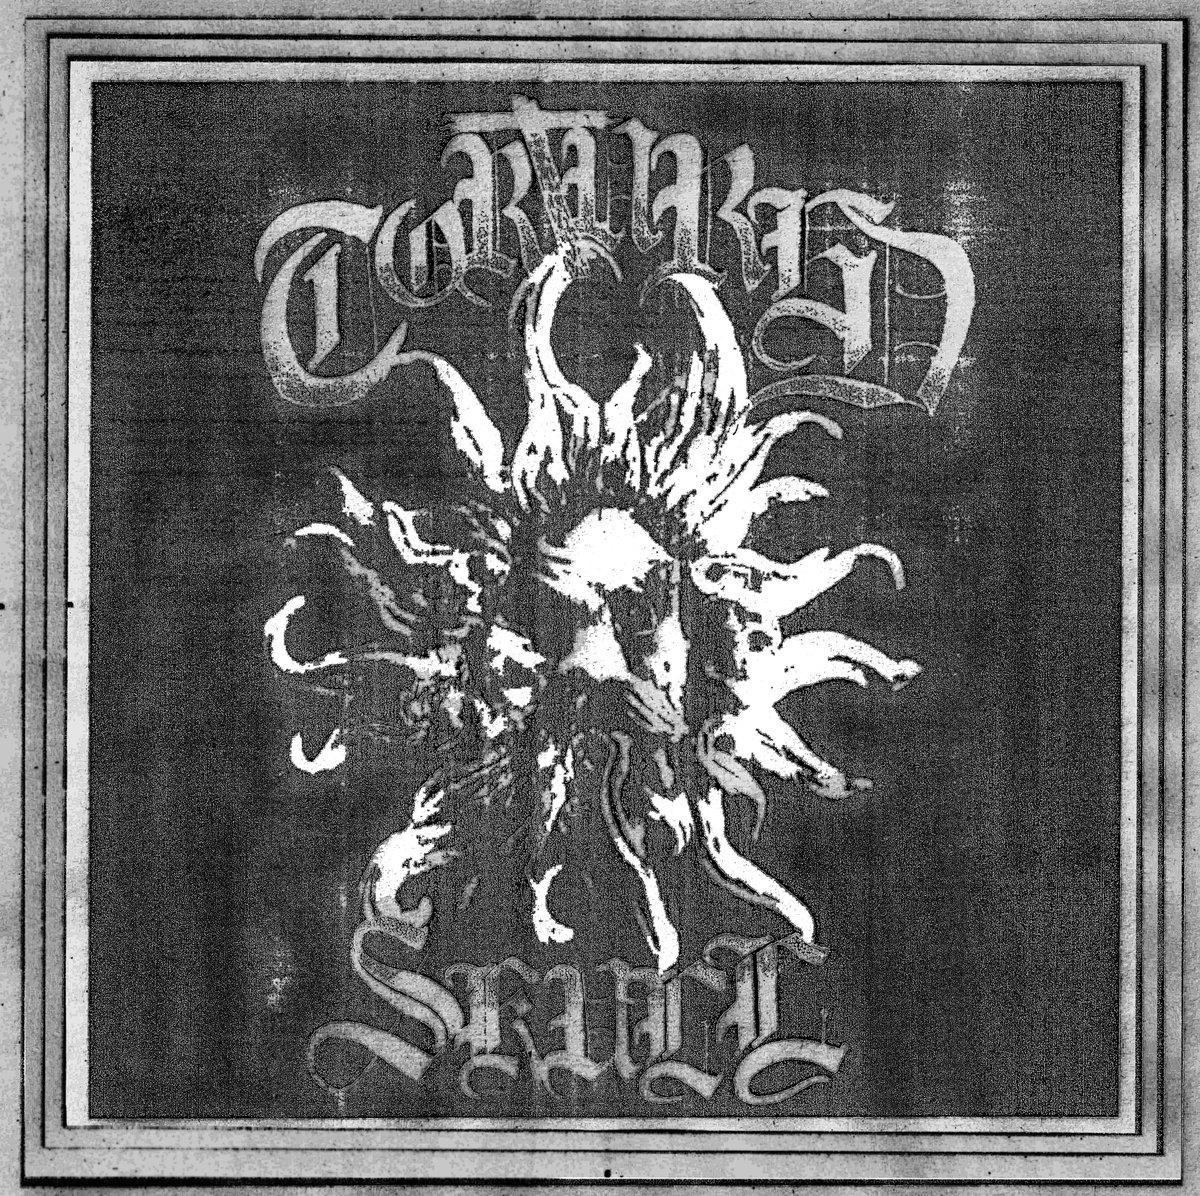 Tortured Skull